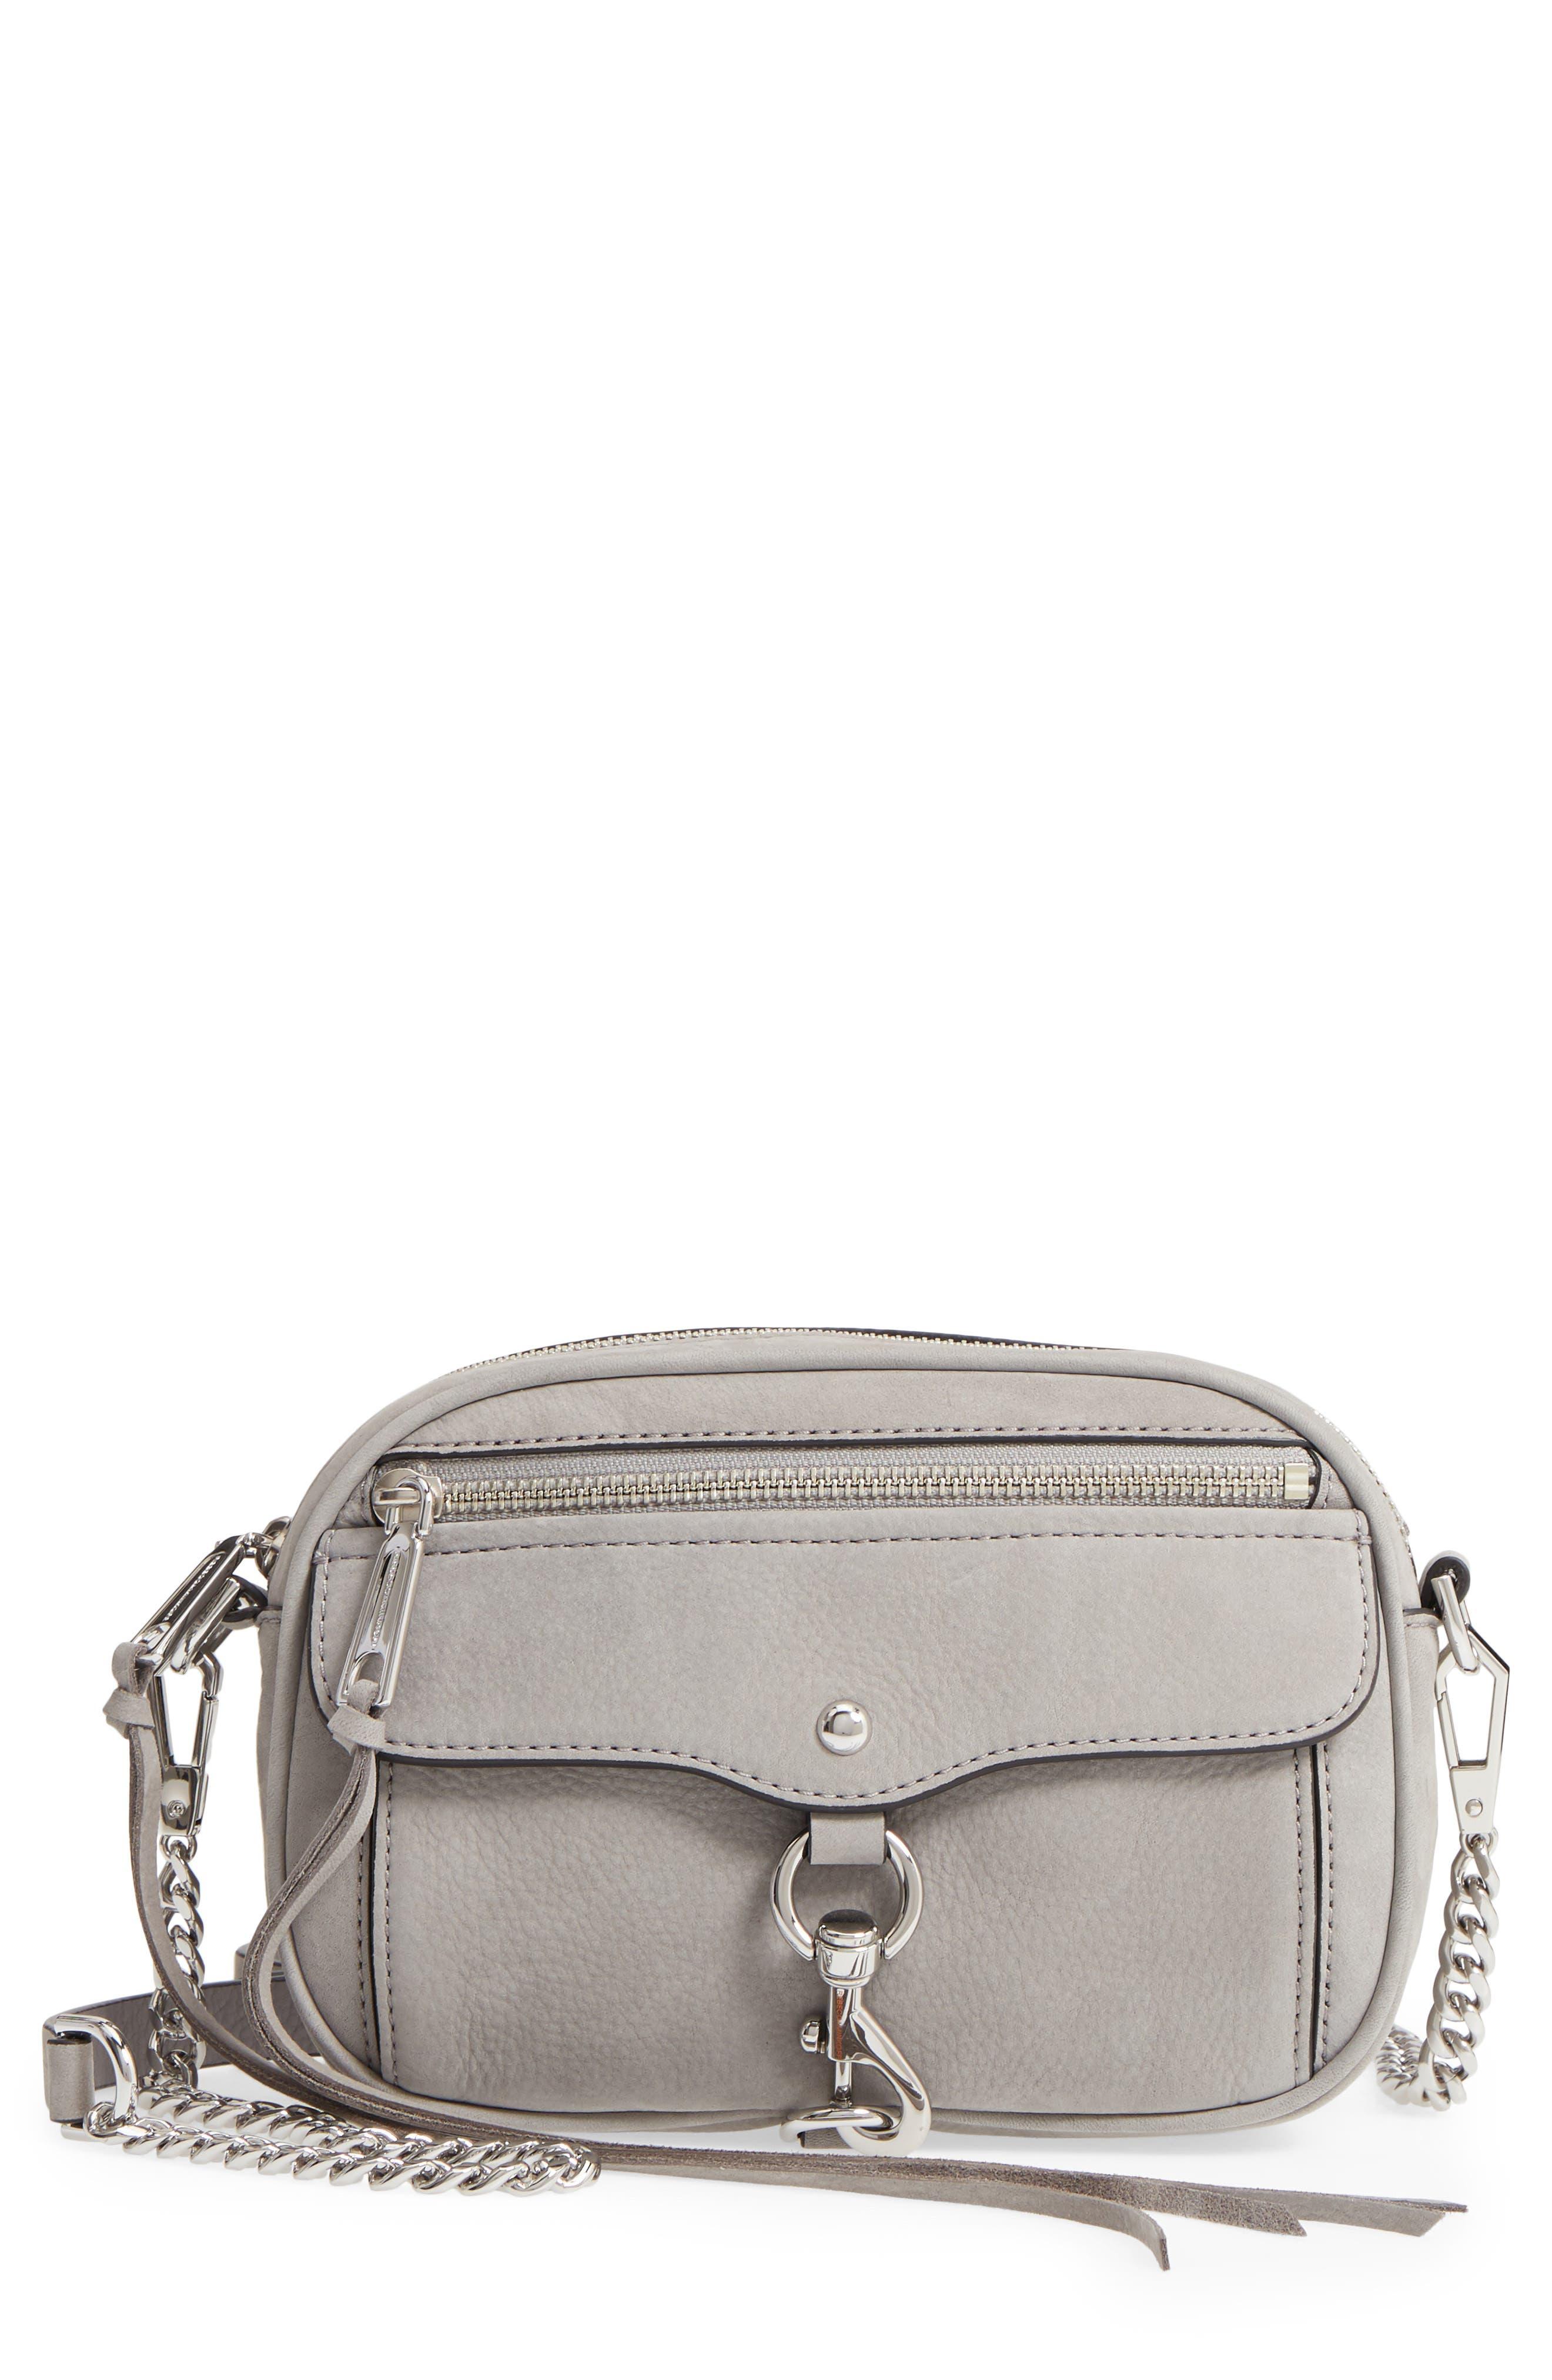 REBECCA MINKOFF,                             Blythe Leather Crossbody Bag,                             Main thumbnail 1, color,                             020